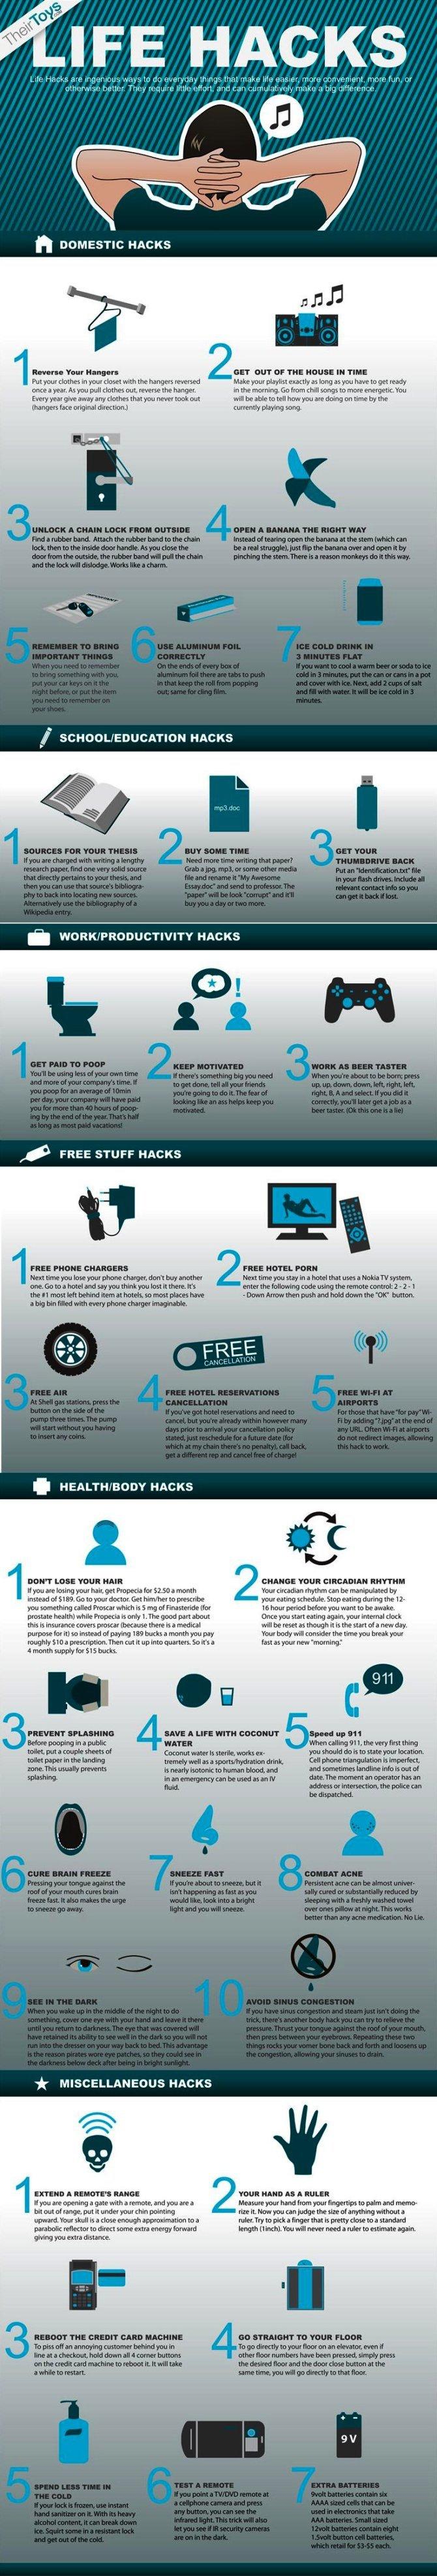 life hacks #infographic